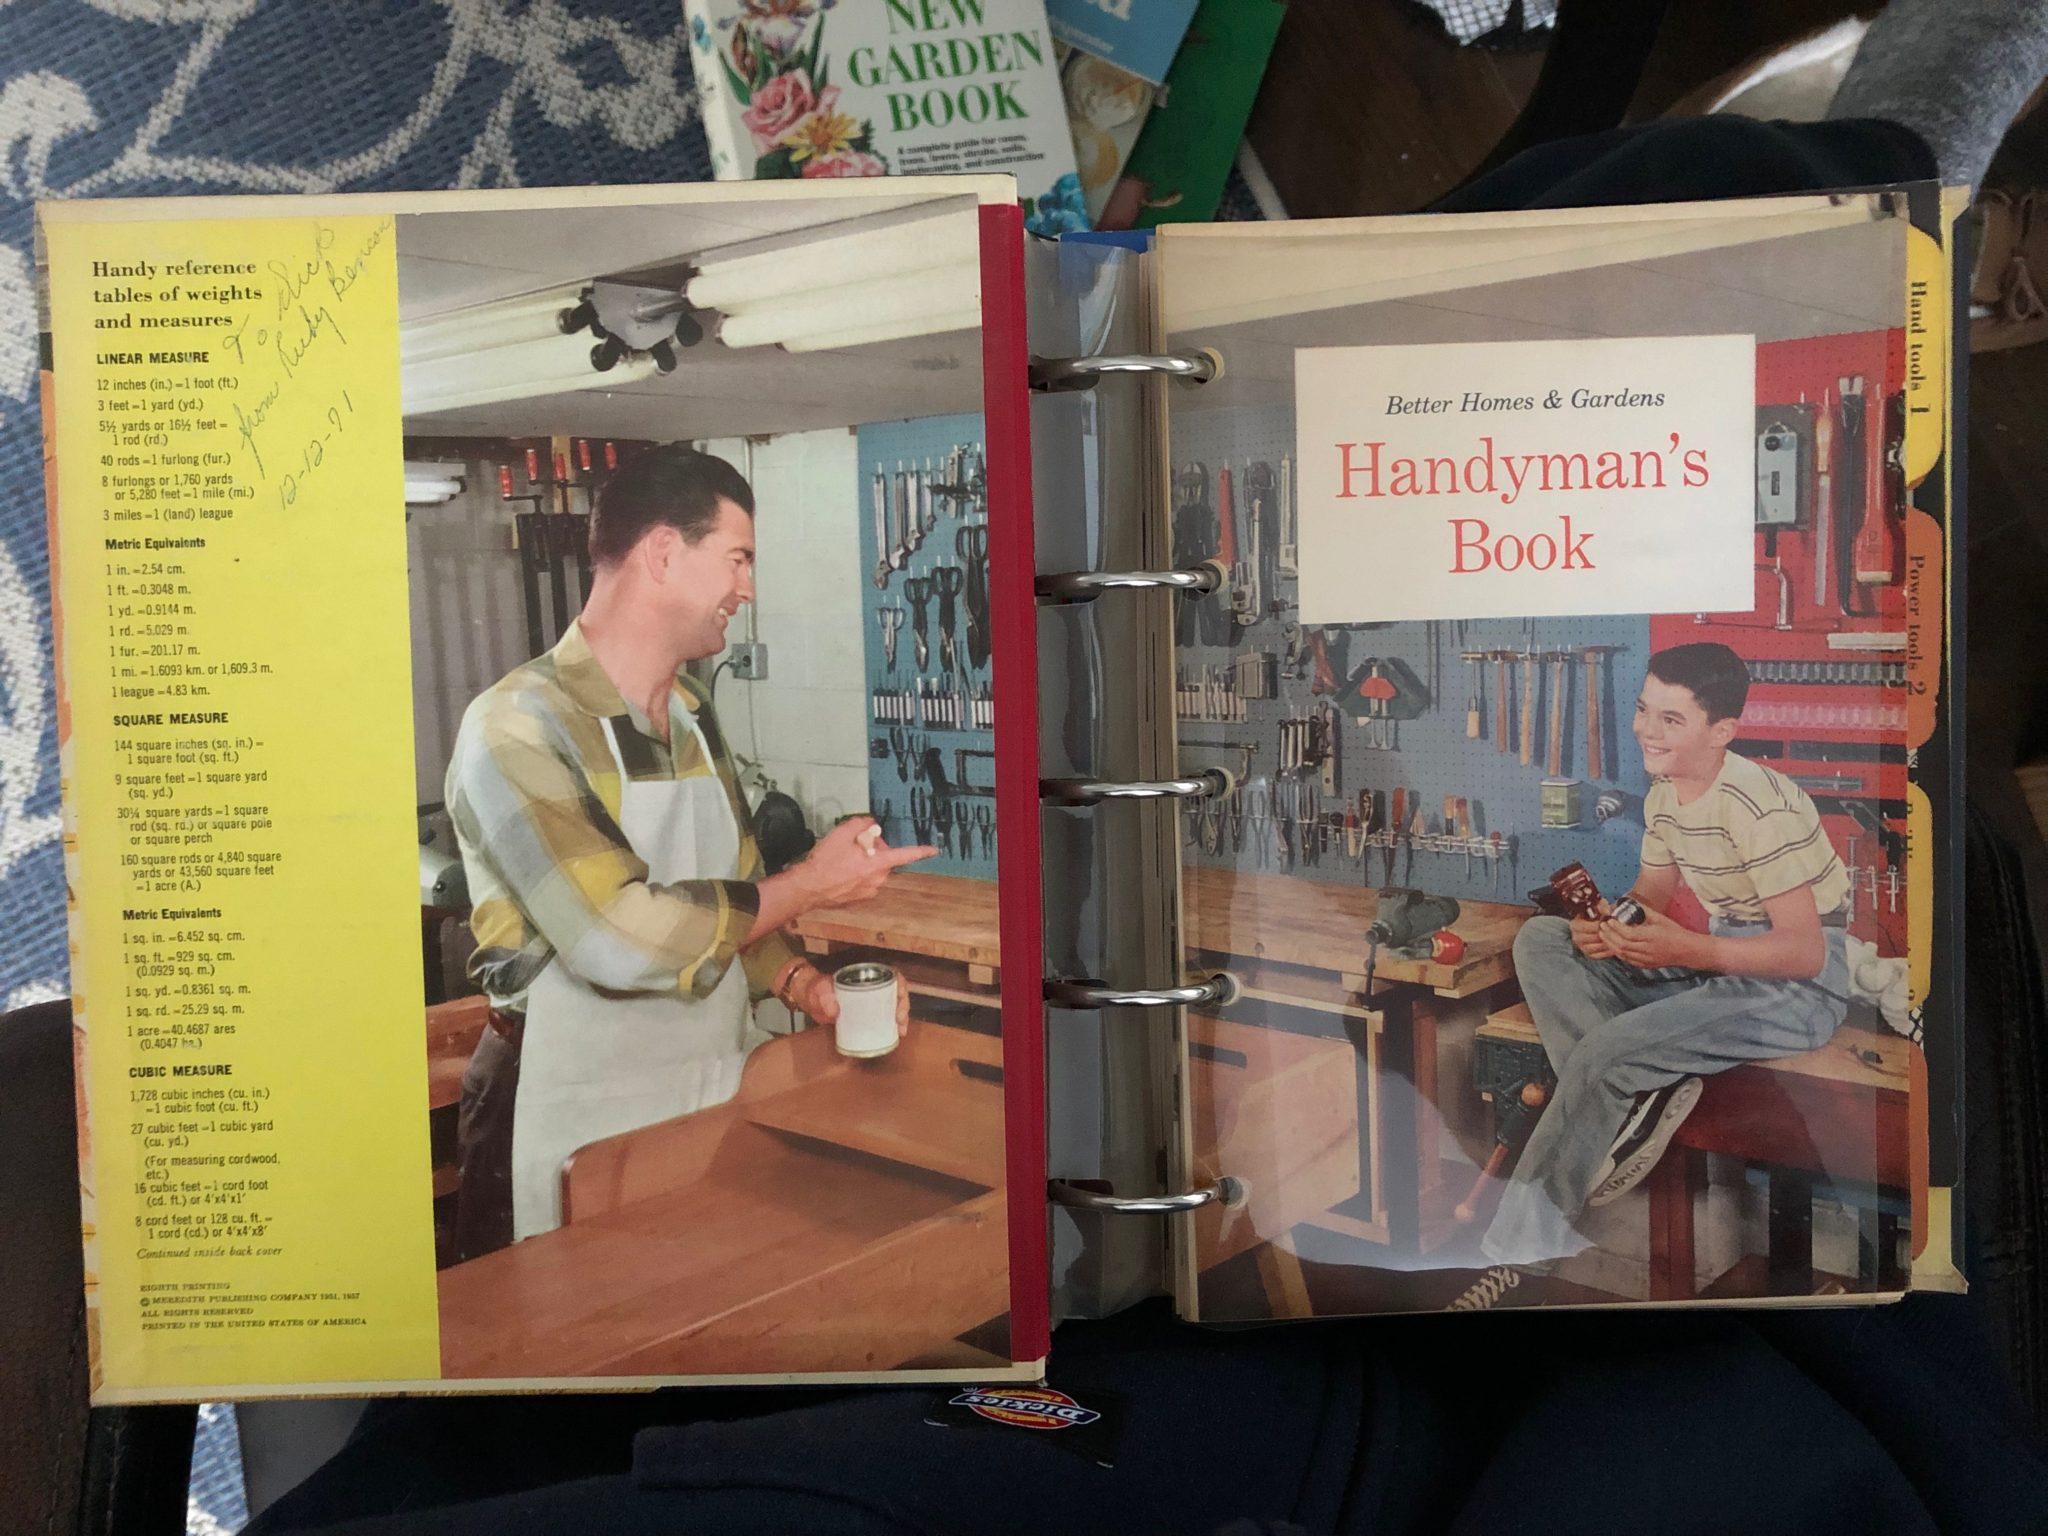 Better Homes & Gardens Handyman's Vintage Book